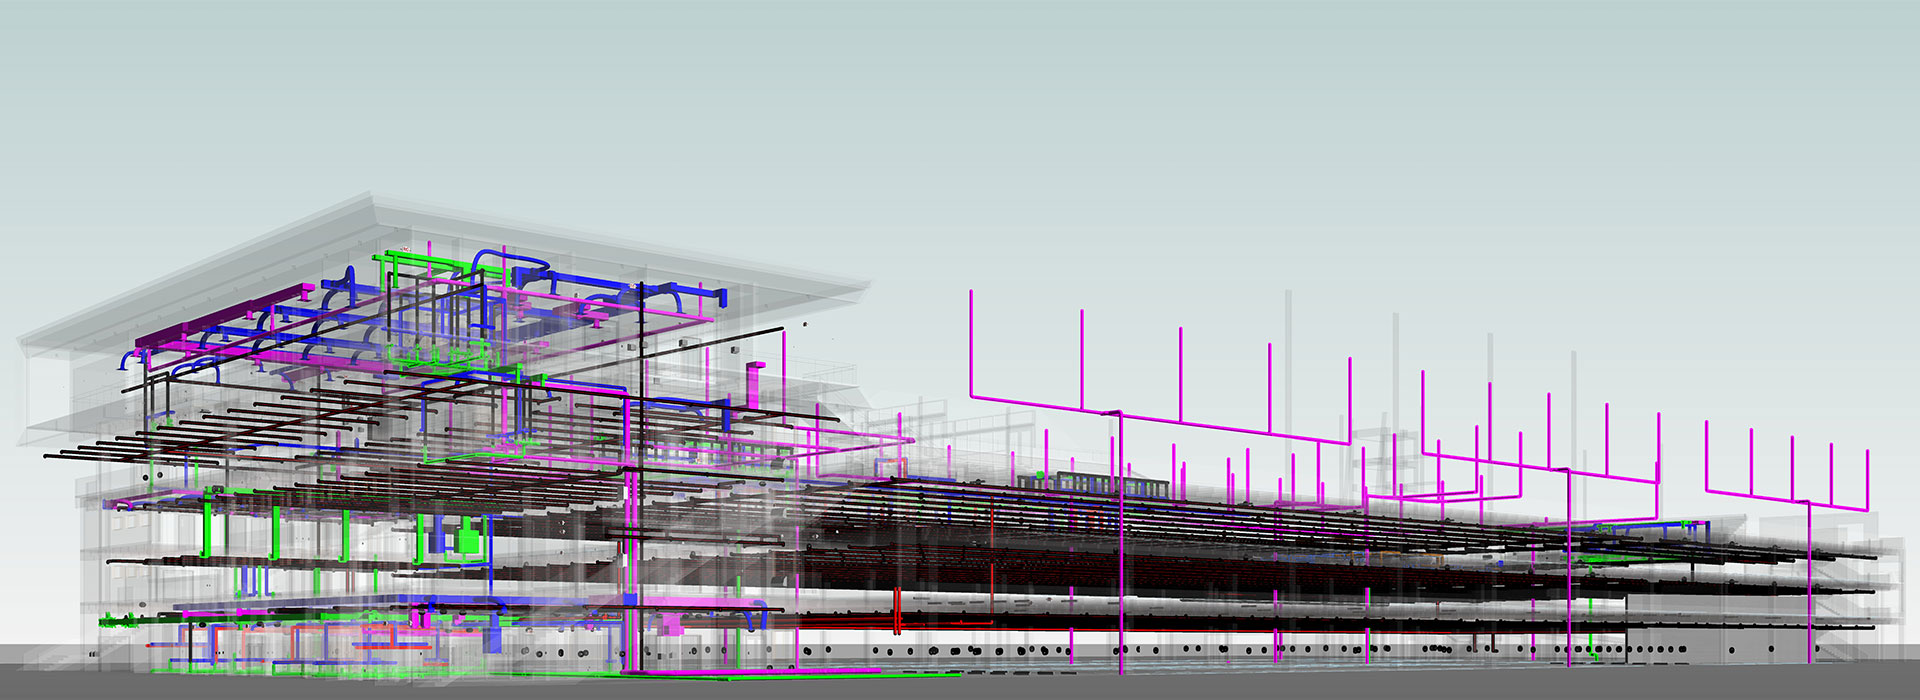 3D-Architecture-MEP-BIM-Model-Commercial-Revit-Modeling-by-United-BIM